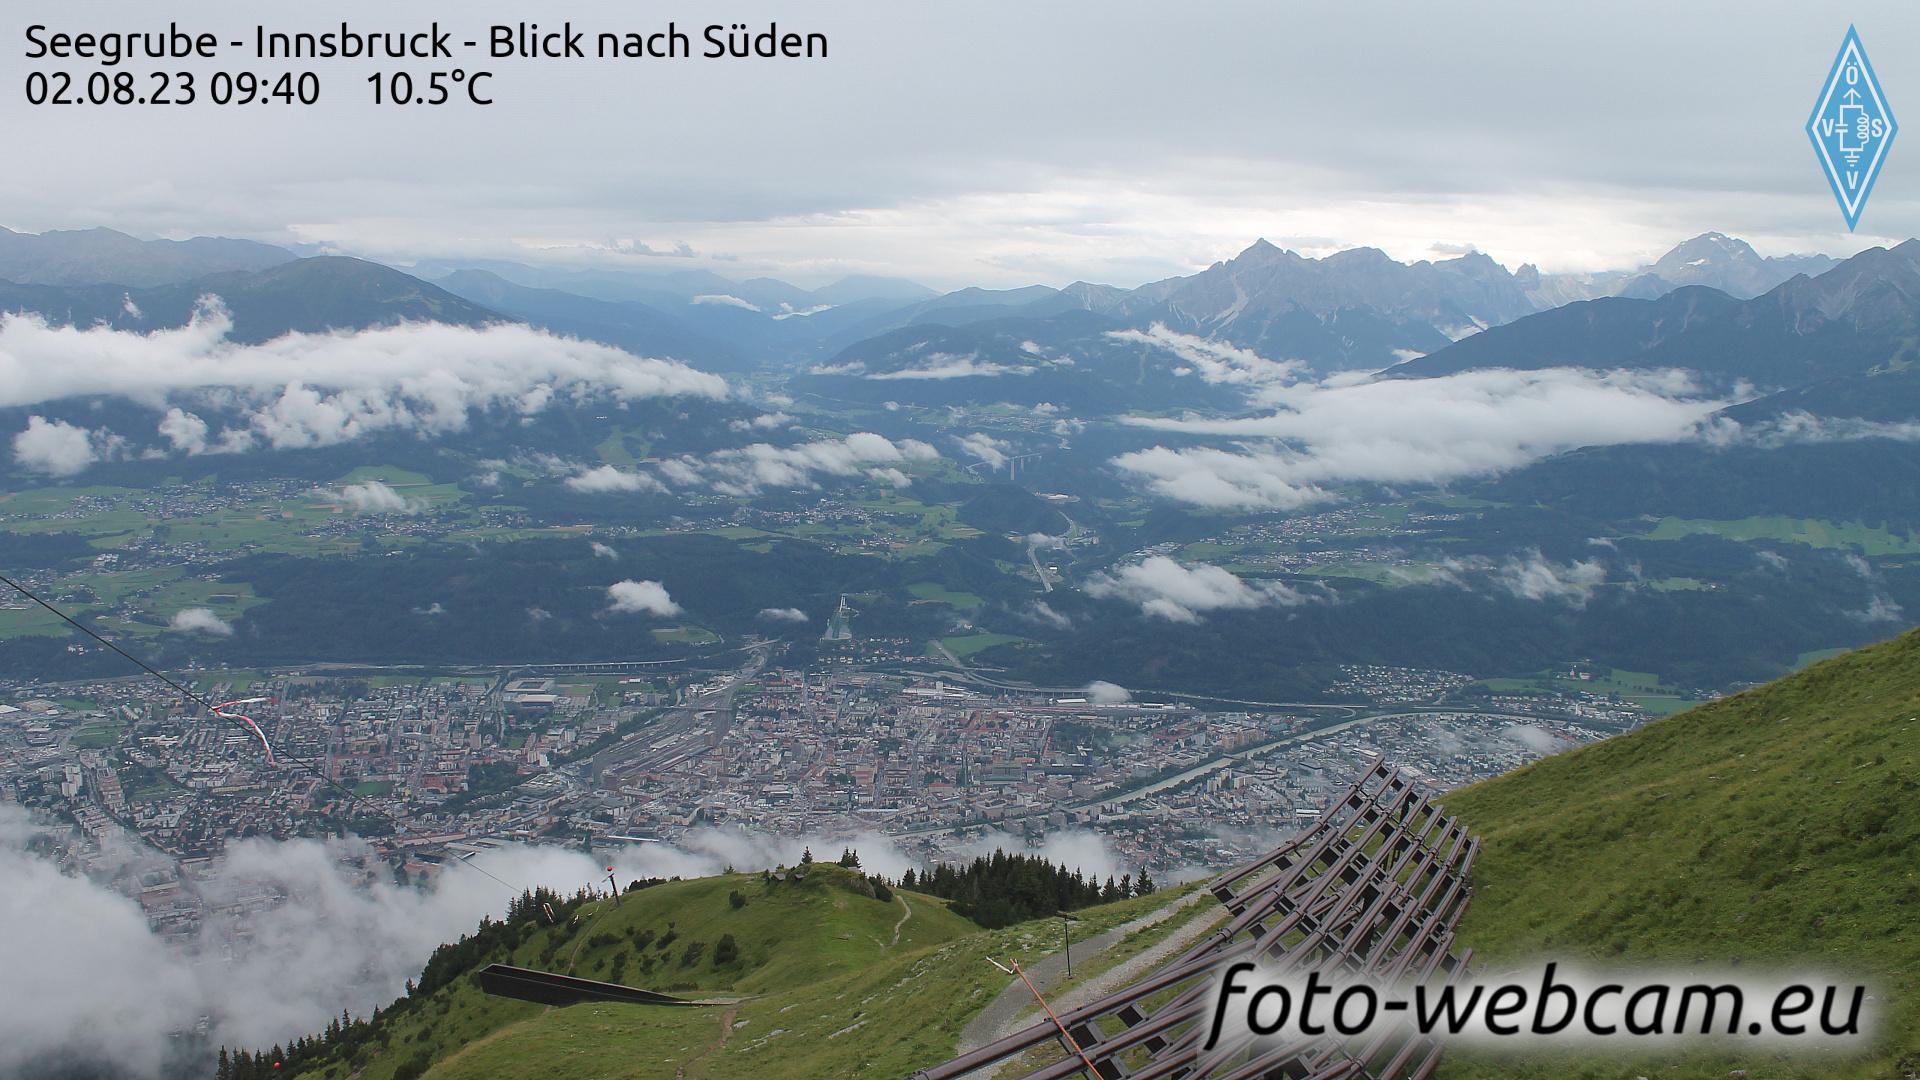 Innsbruck Wed. 09:18